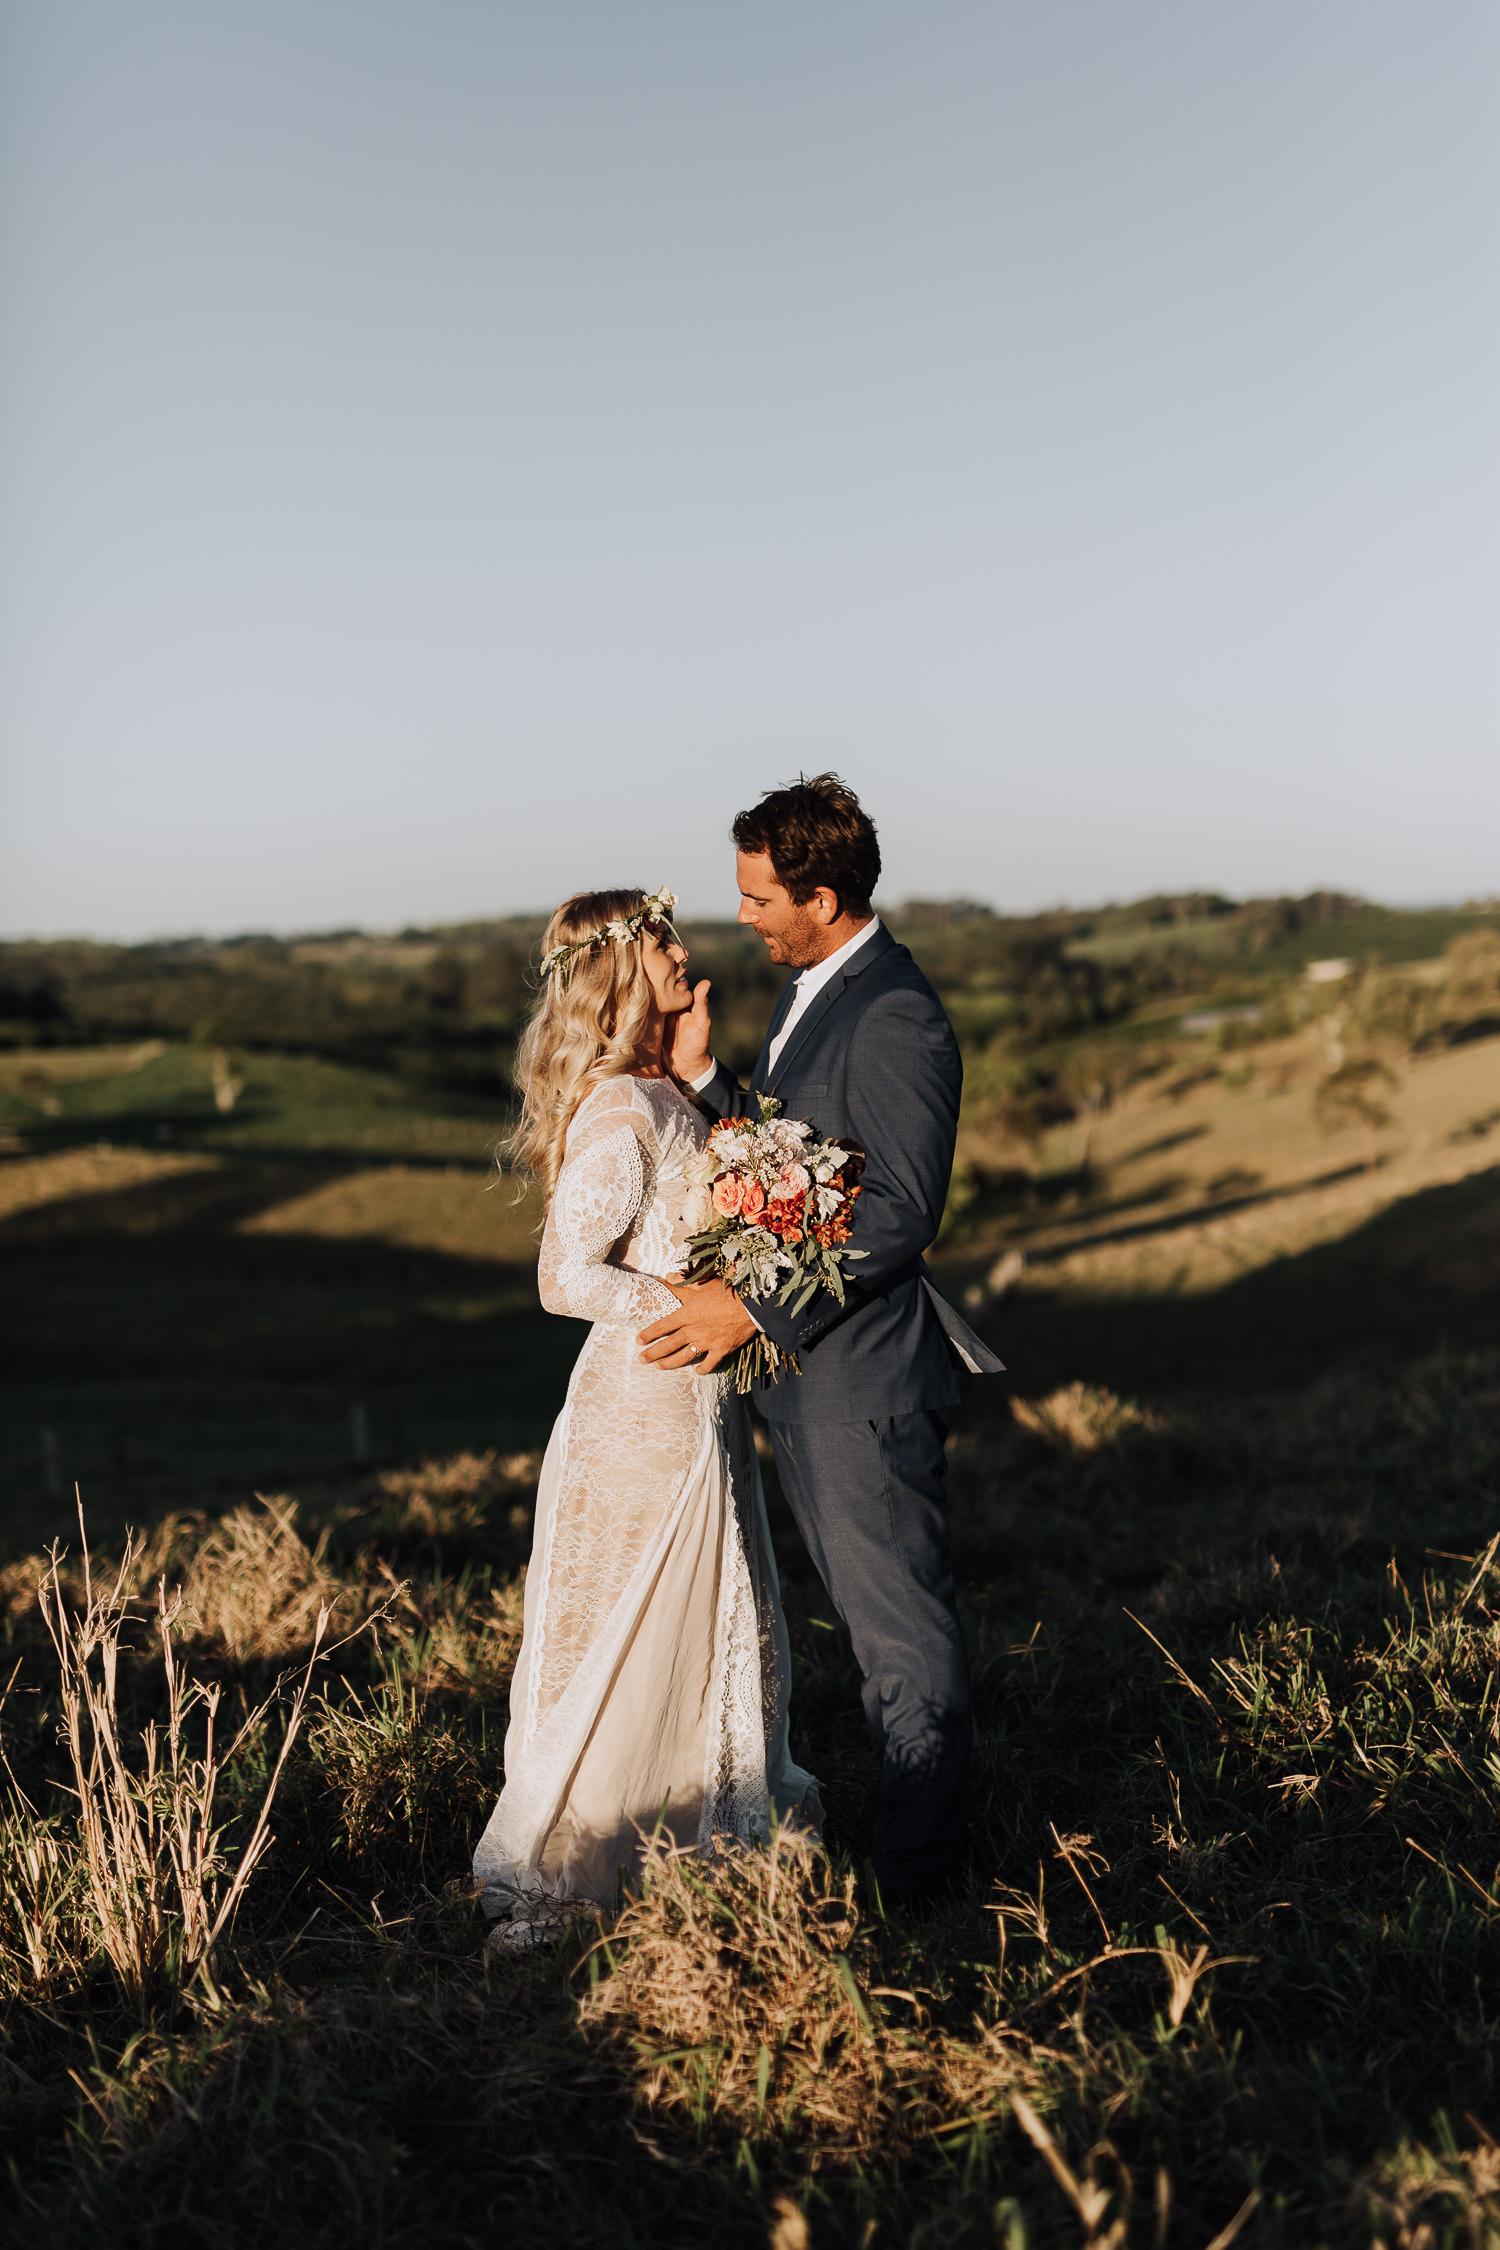 byron_bay_wedding_photographer088.jpg